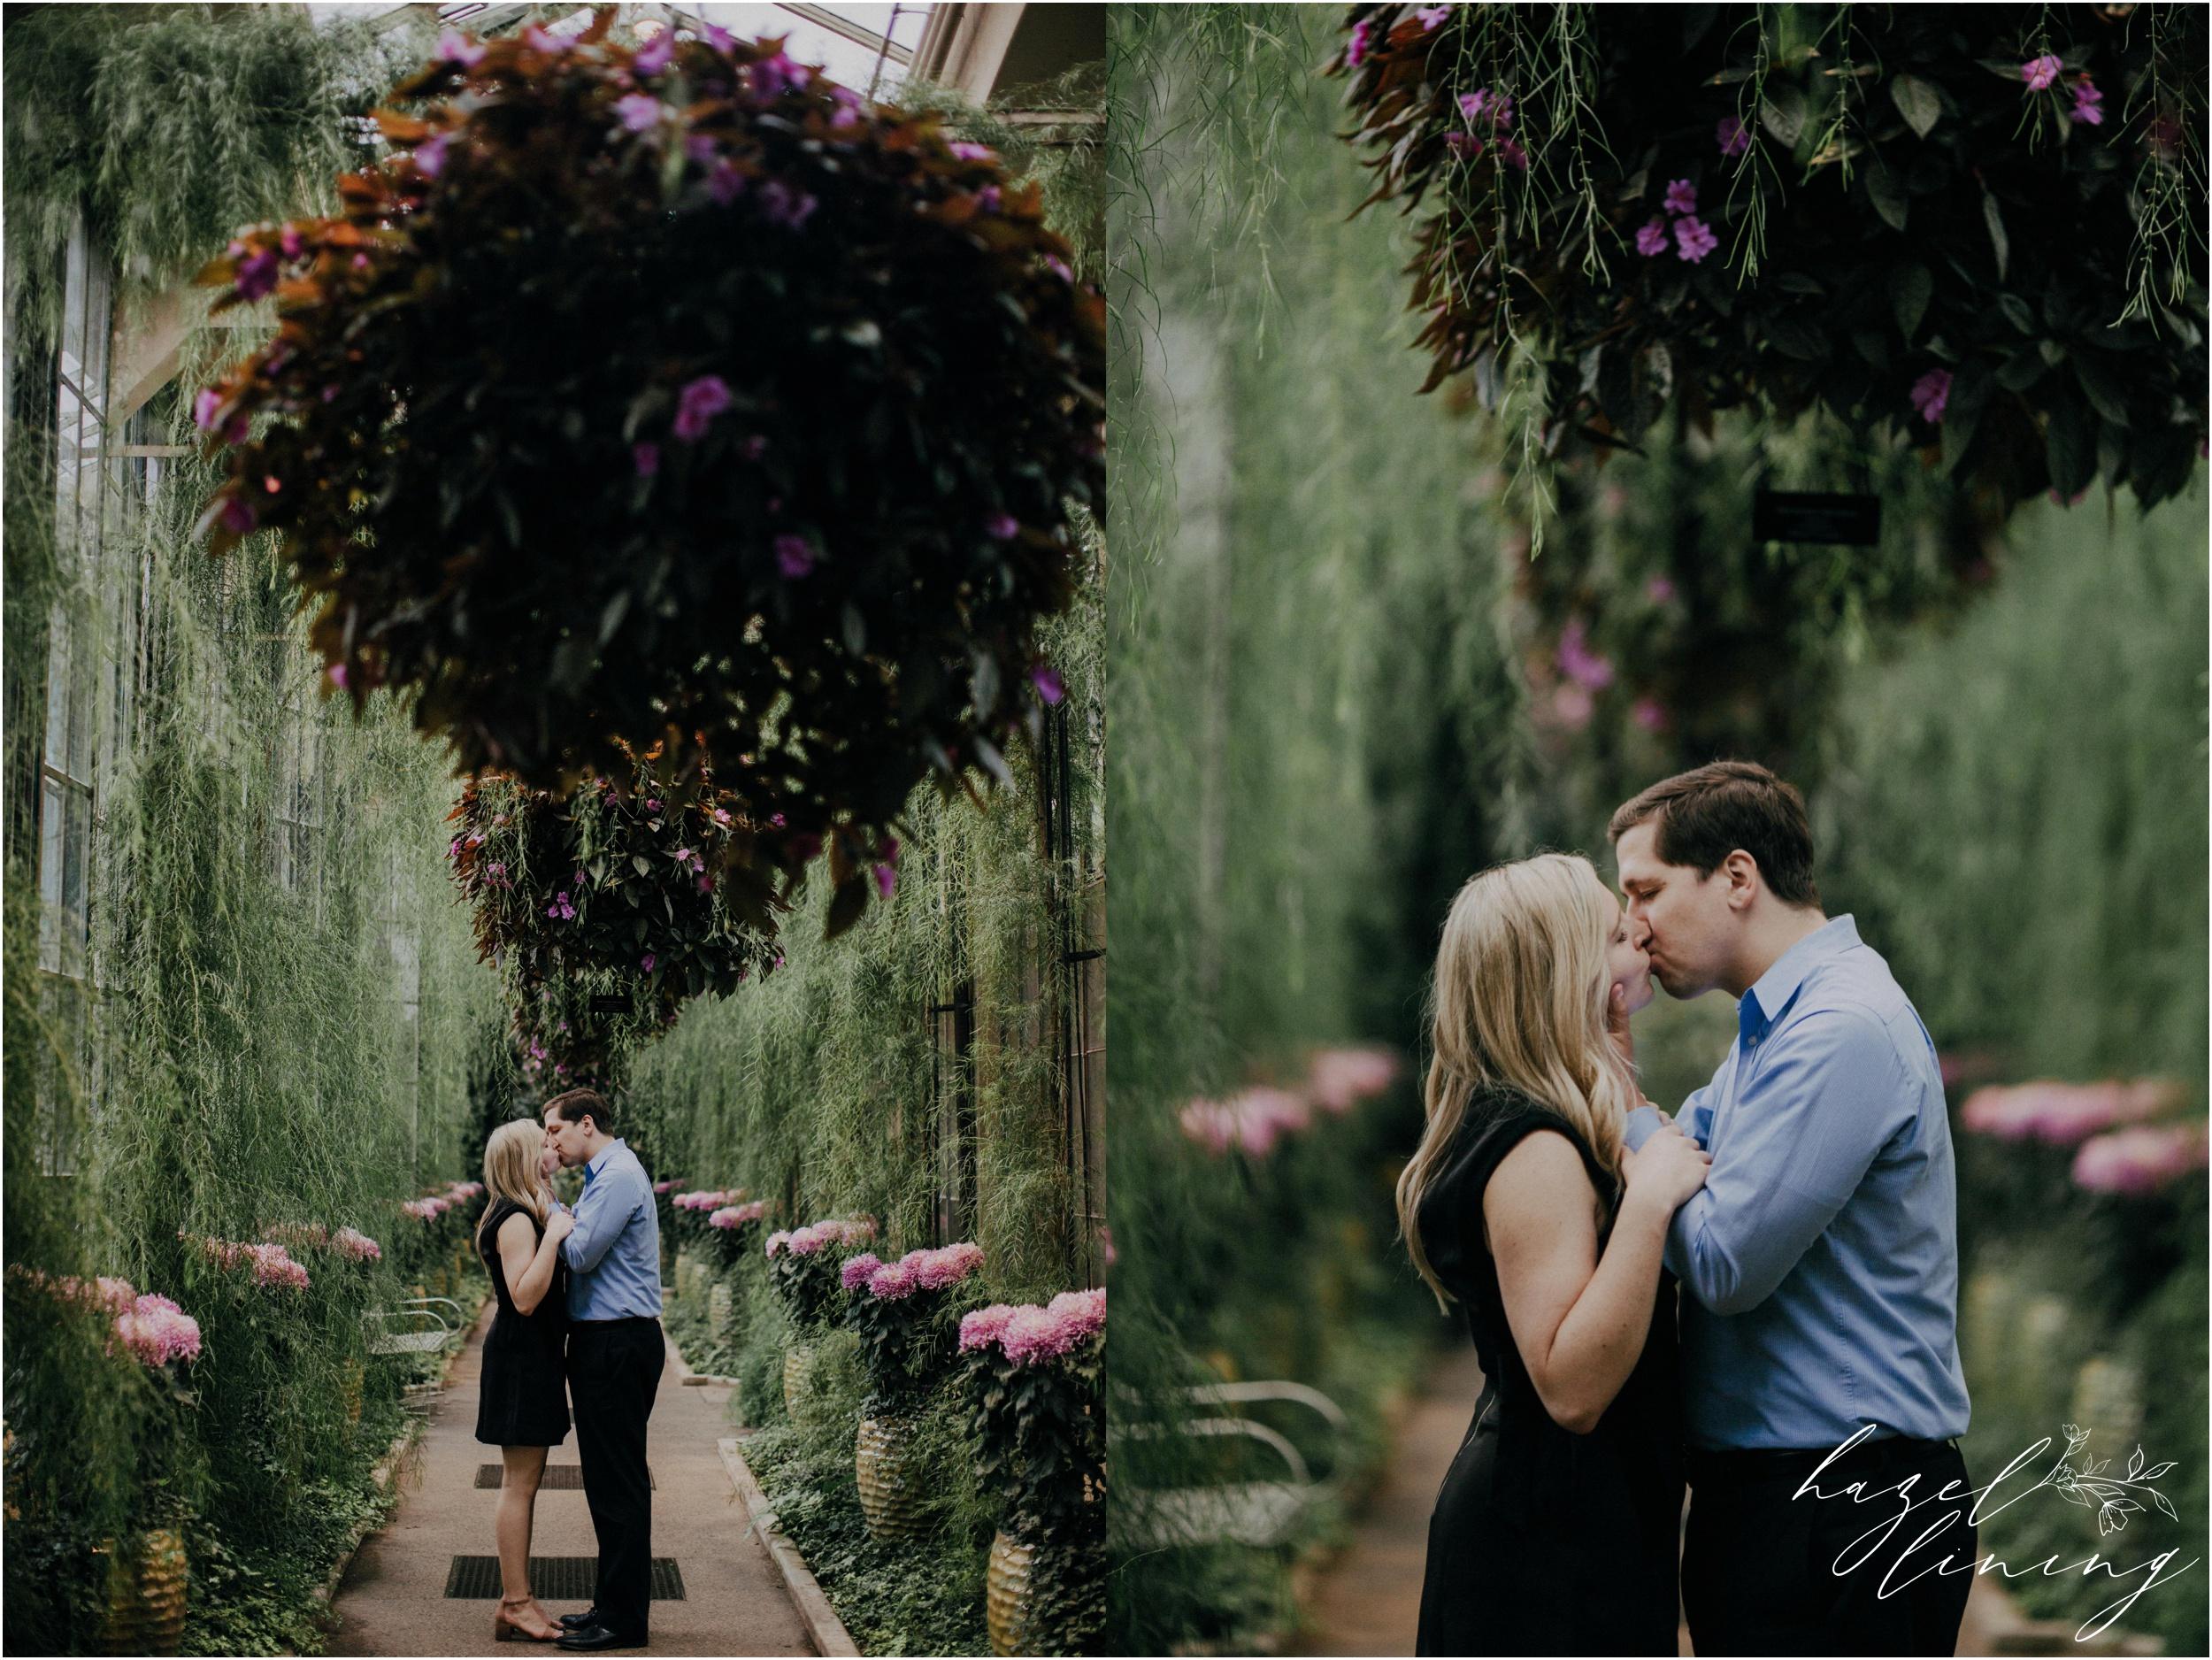 victoria-travis-logan-mayes-longwood-gardens-kennett-square-philadelphia-engagement-session-hazel-lining-photography-destination-elopement-wedding-engagement-photography_0049.jpg